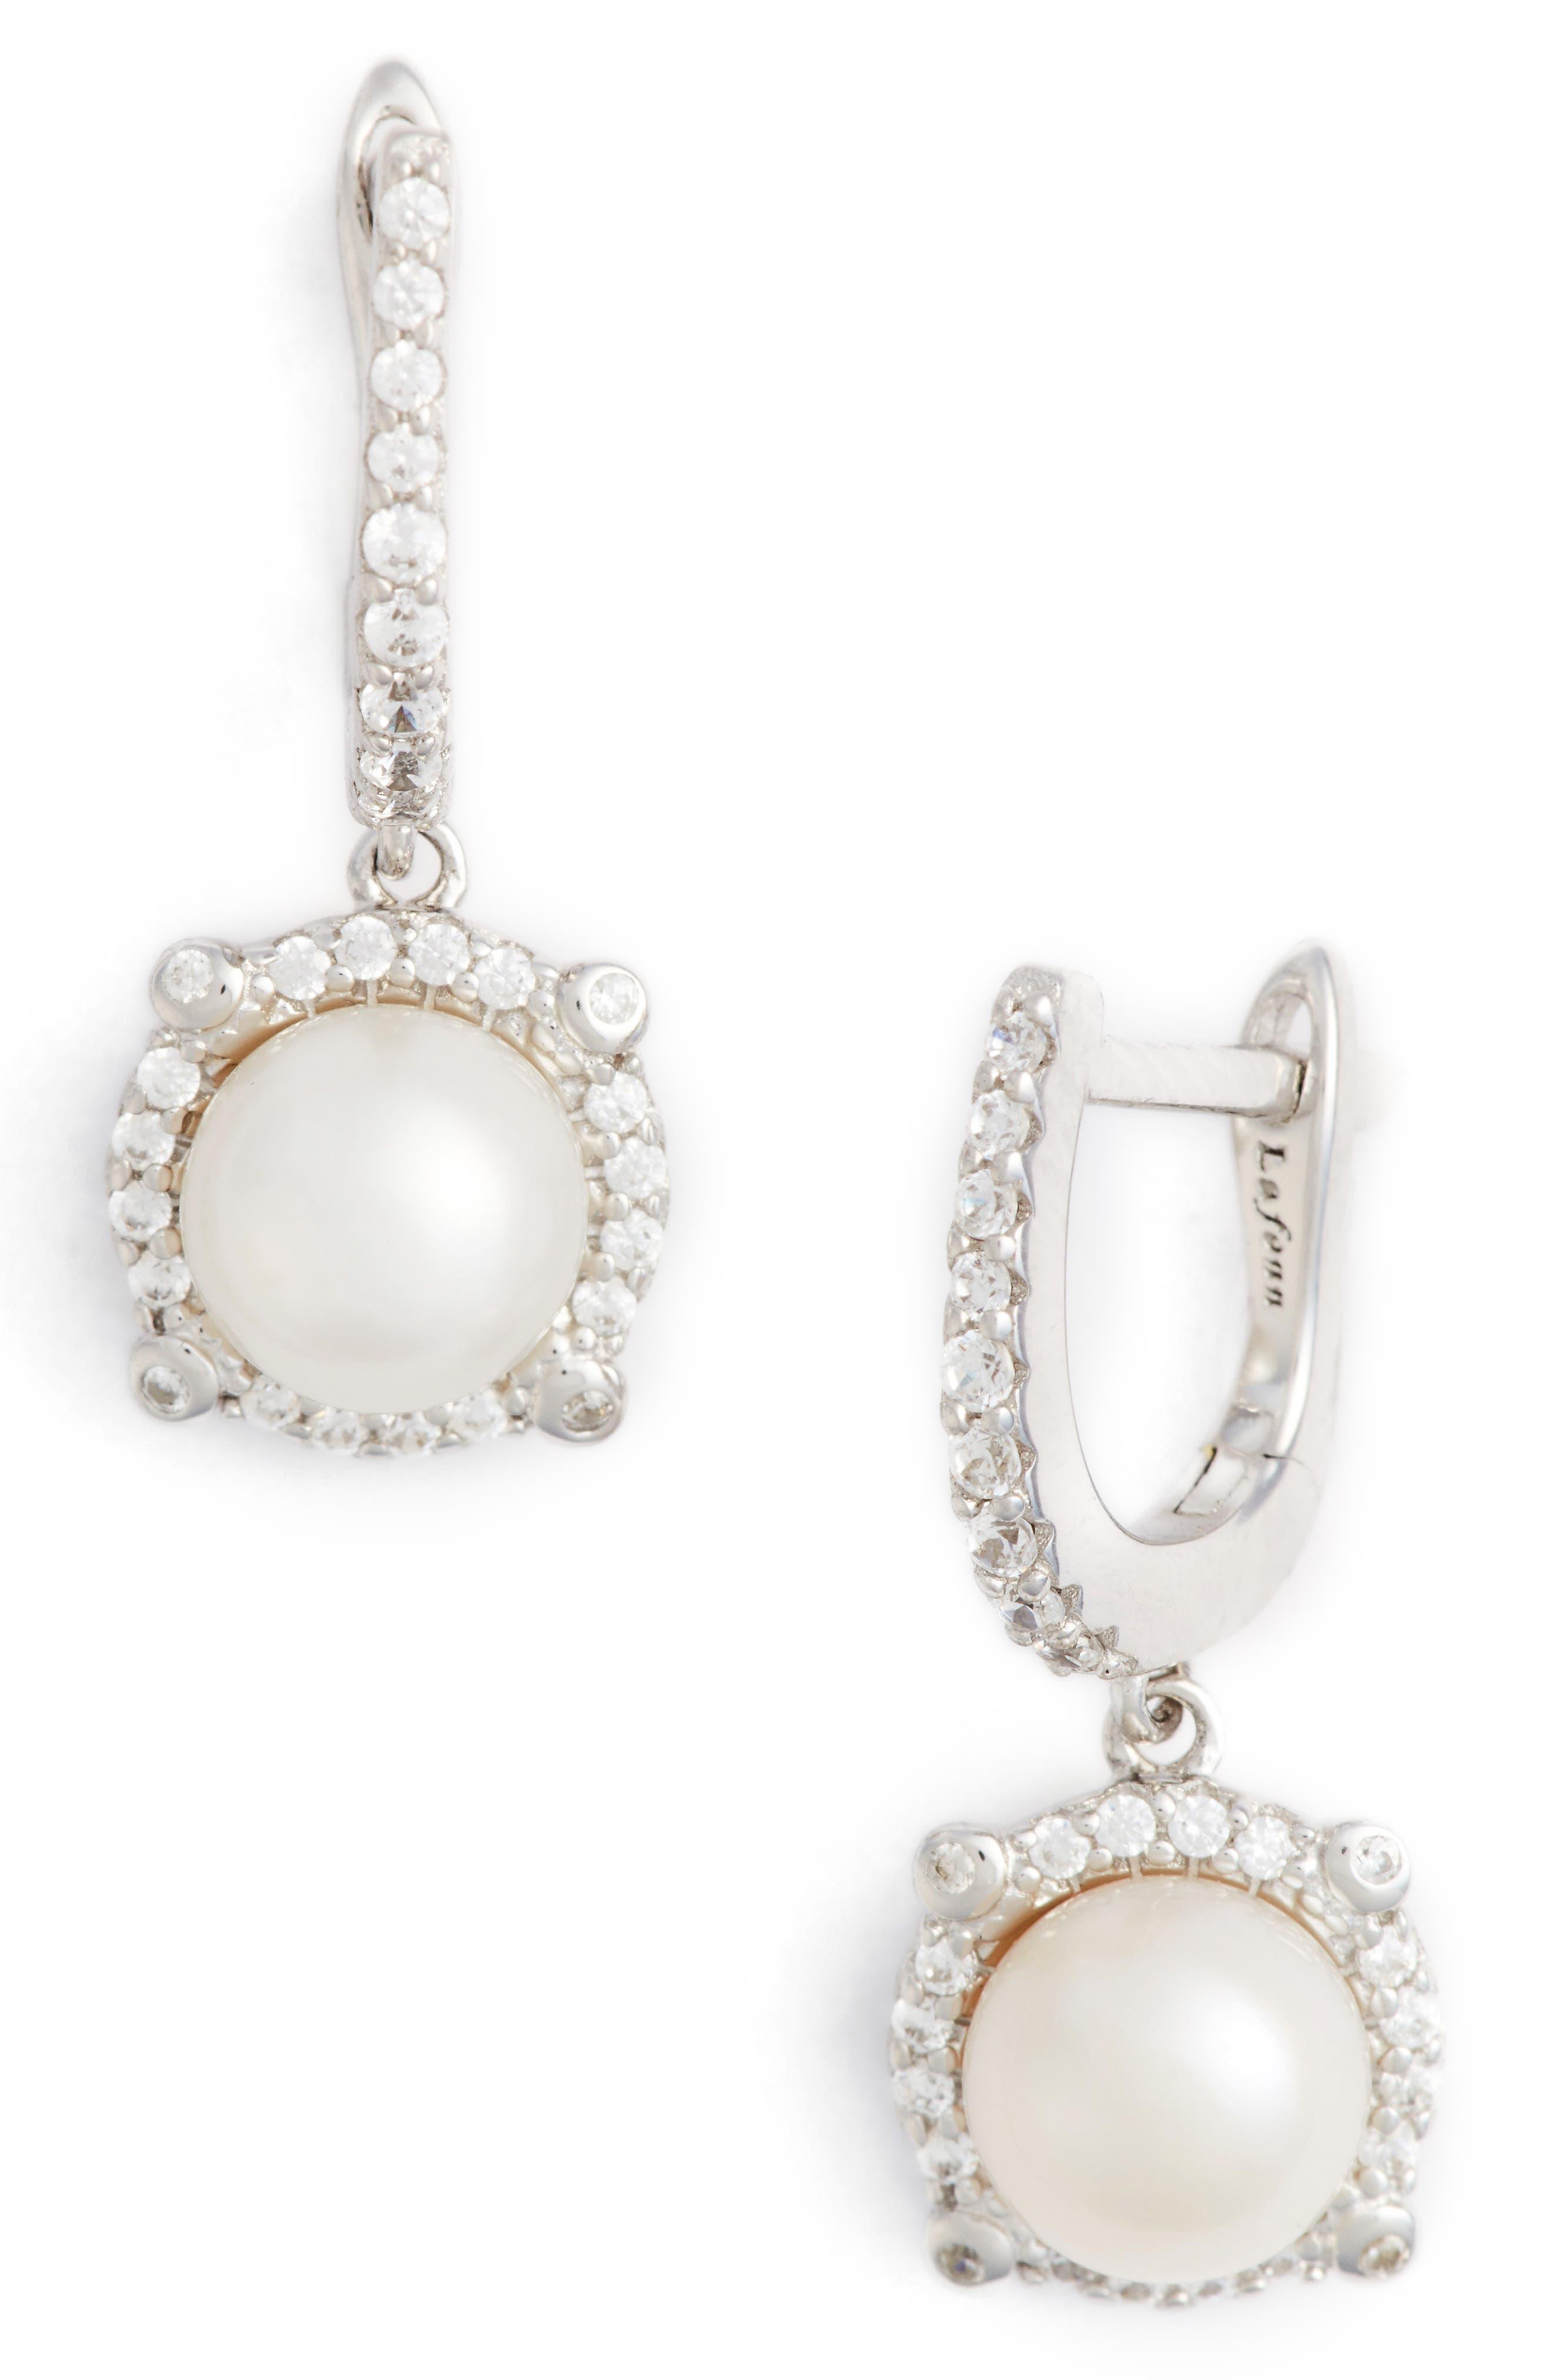 Simulated Diamond & Pearl Drop Earrings,                         Main,                         color, Silver/ Pearl/ Clear